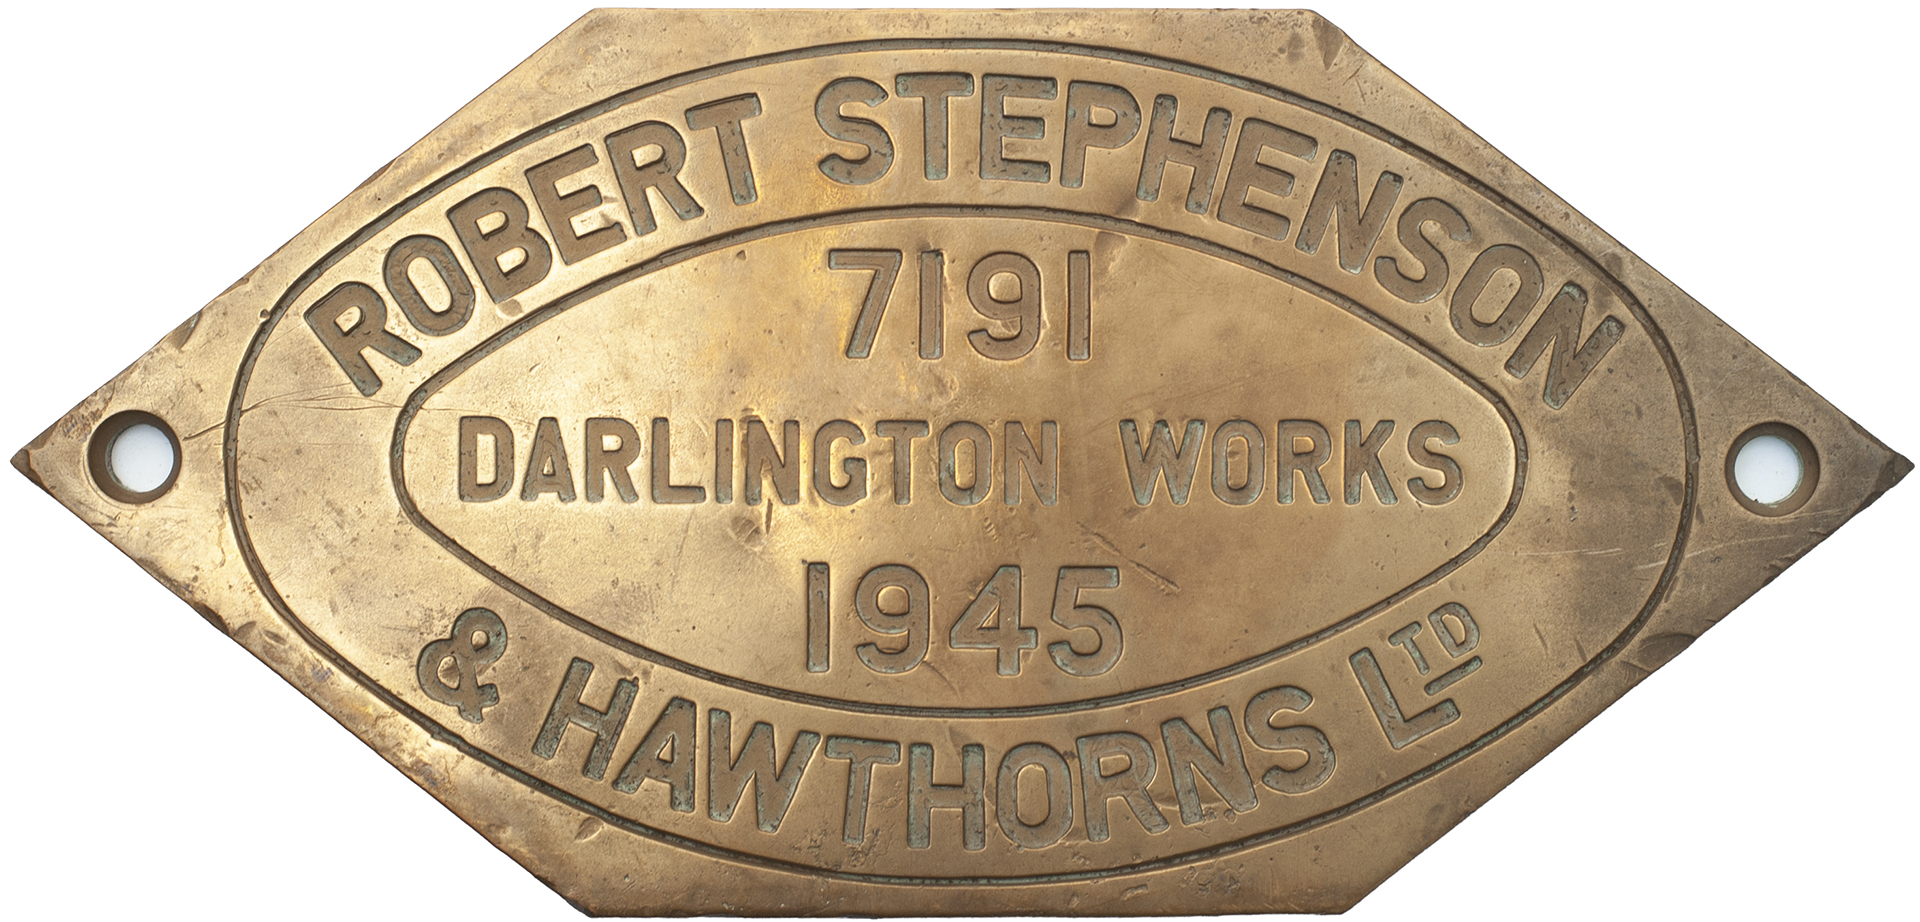 Worksplate ROBERT STEPHENSON & HAWTHORNS LTD DARLINGTON WORKS 7191 1945 ex South African Railways